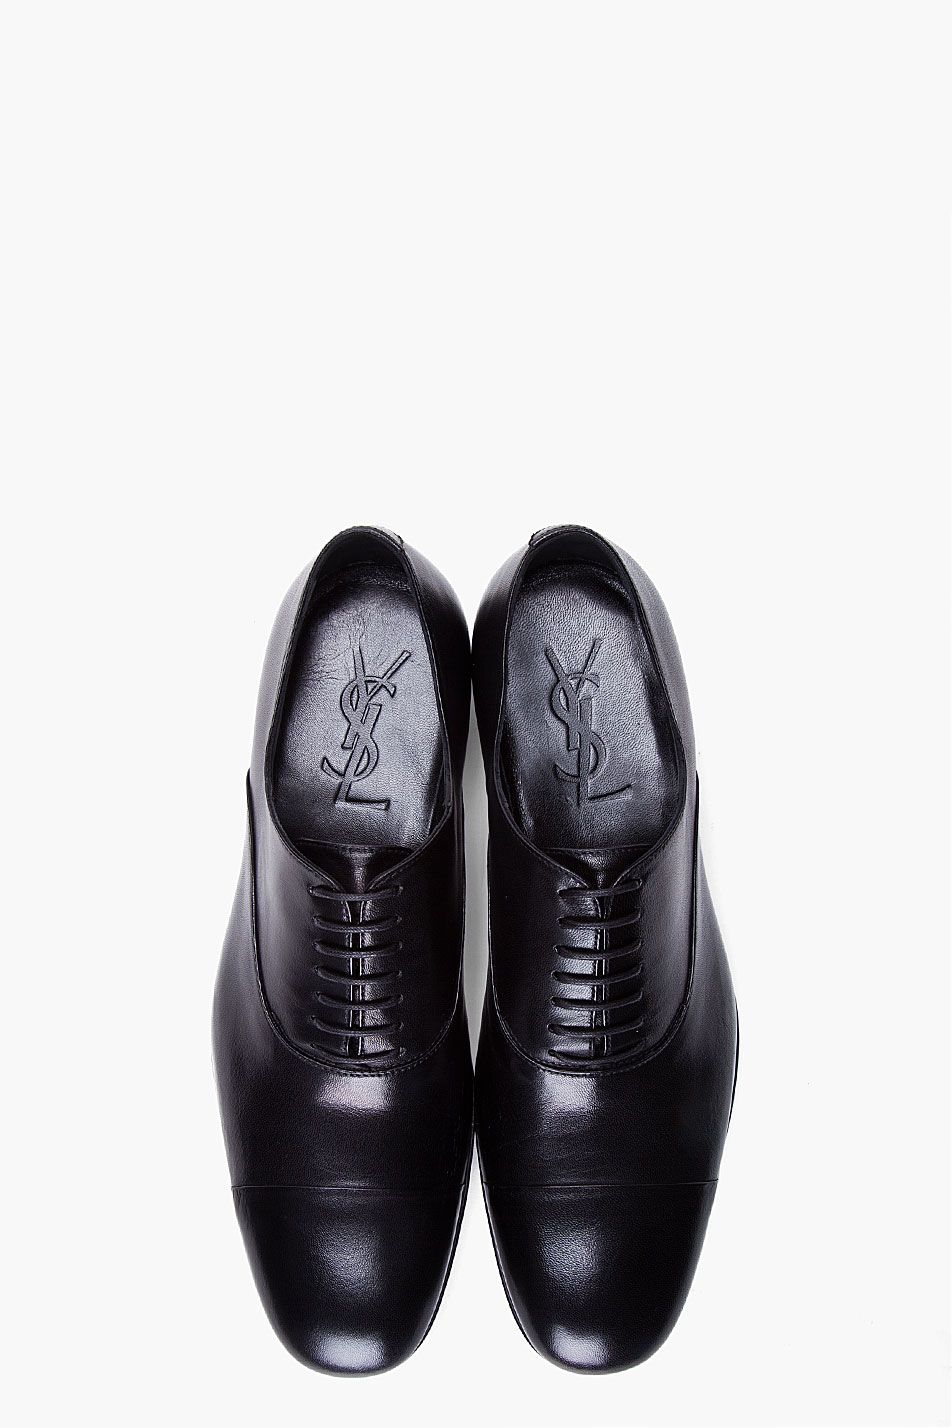 bba7f9d35d Need it, Black Smokey Dress Shoes #YSL | Unfashionable Men | Leather ...